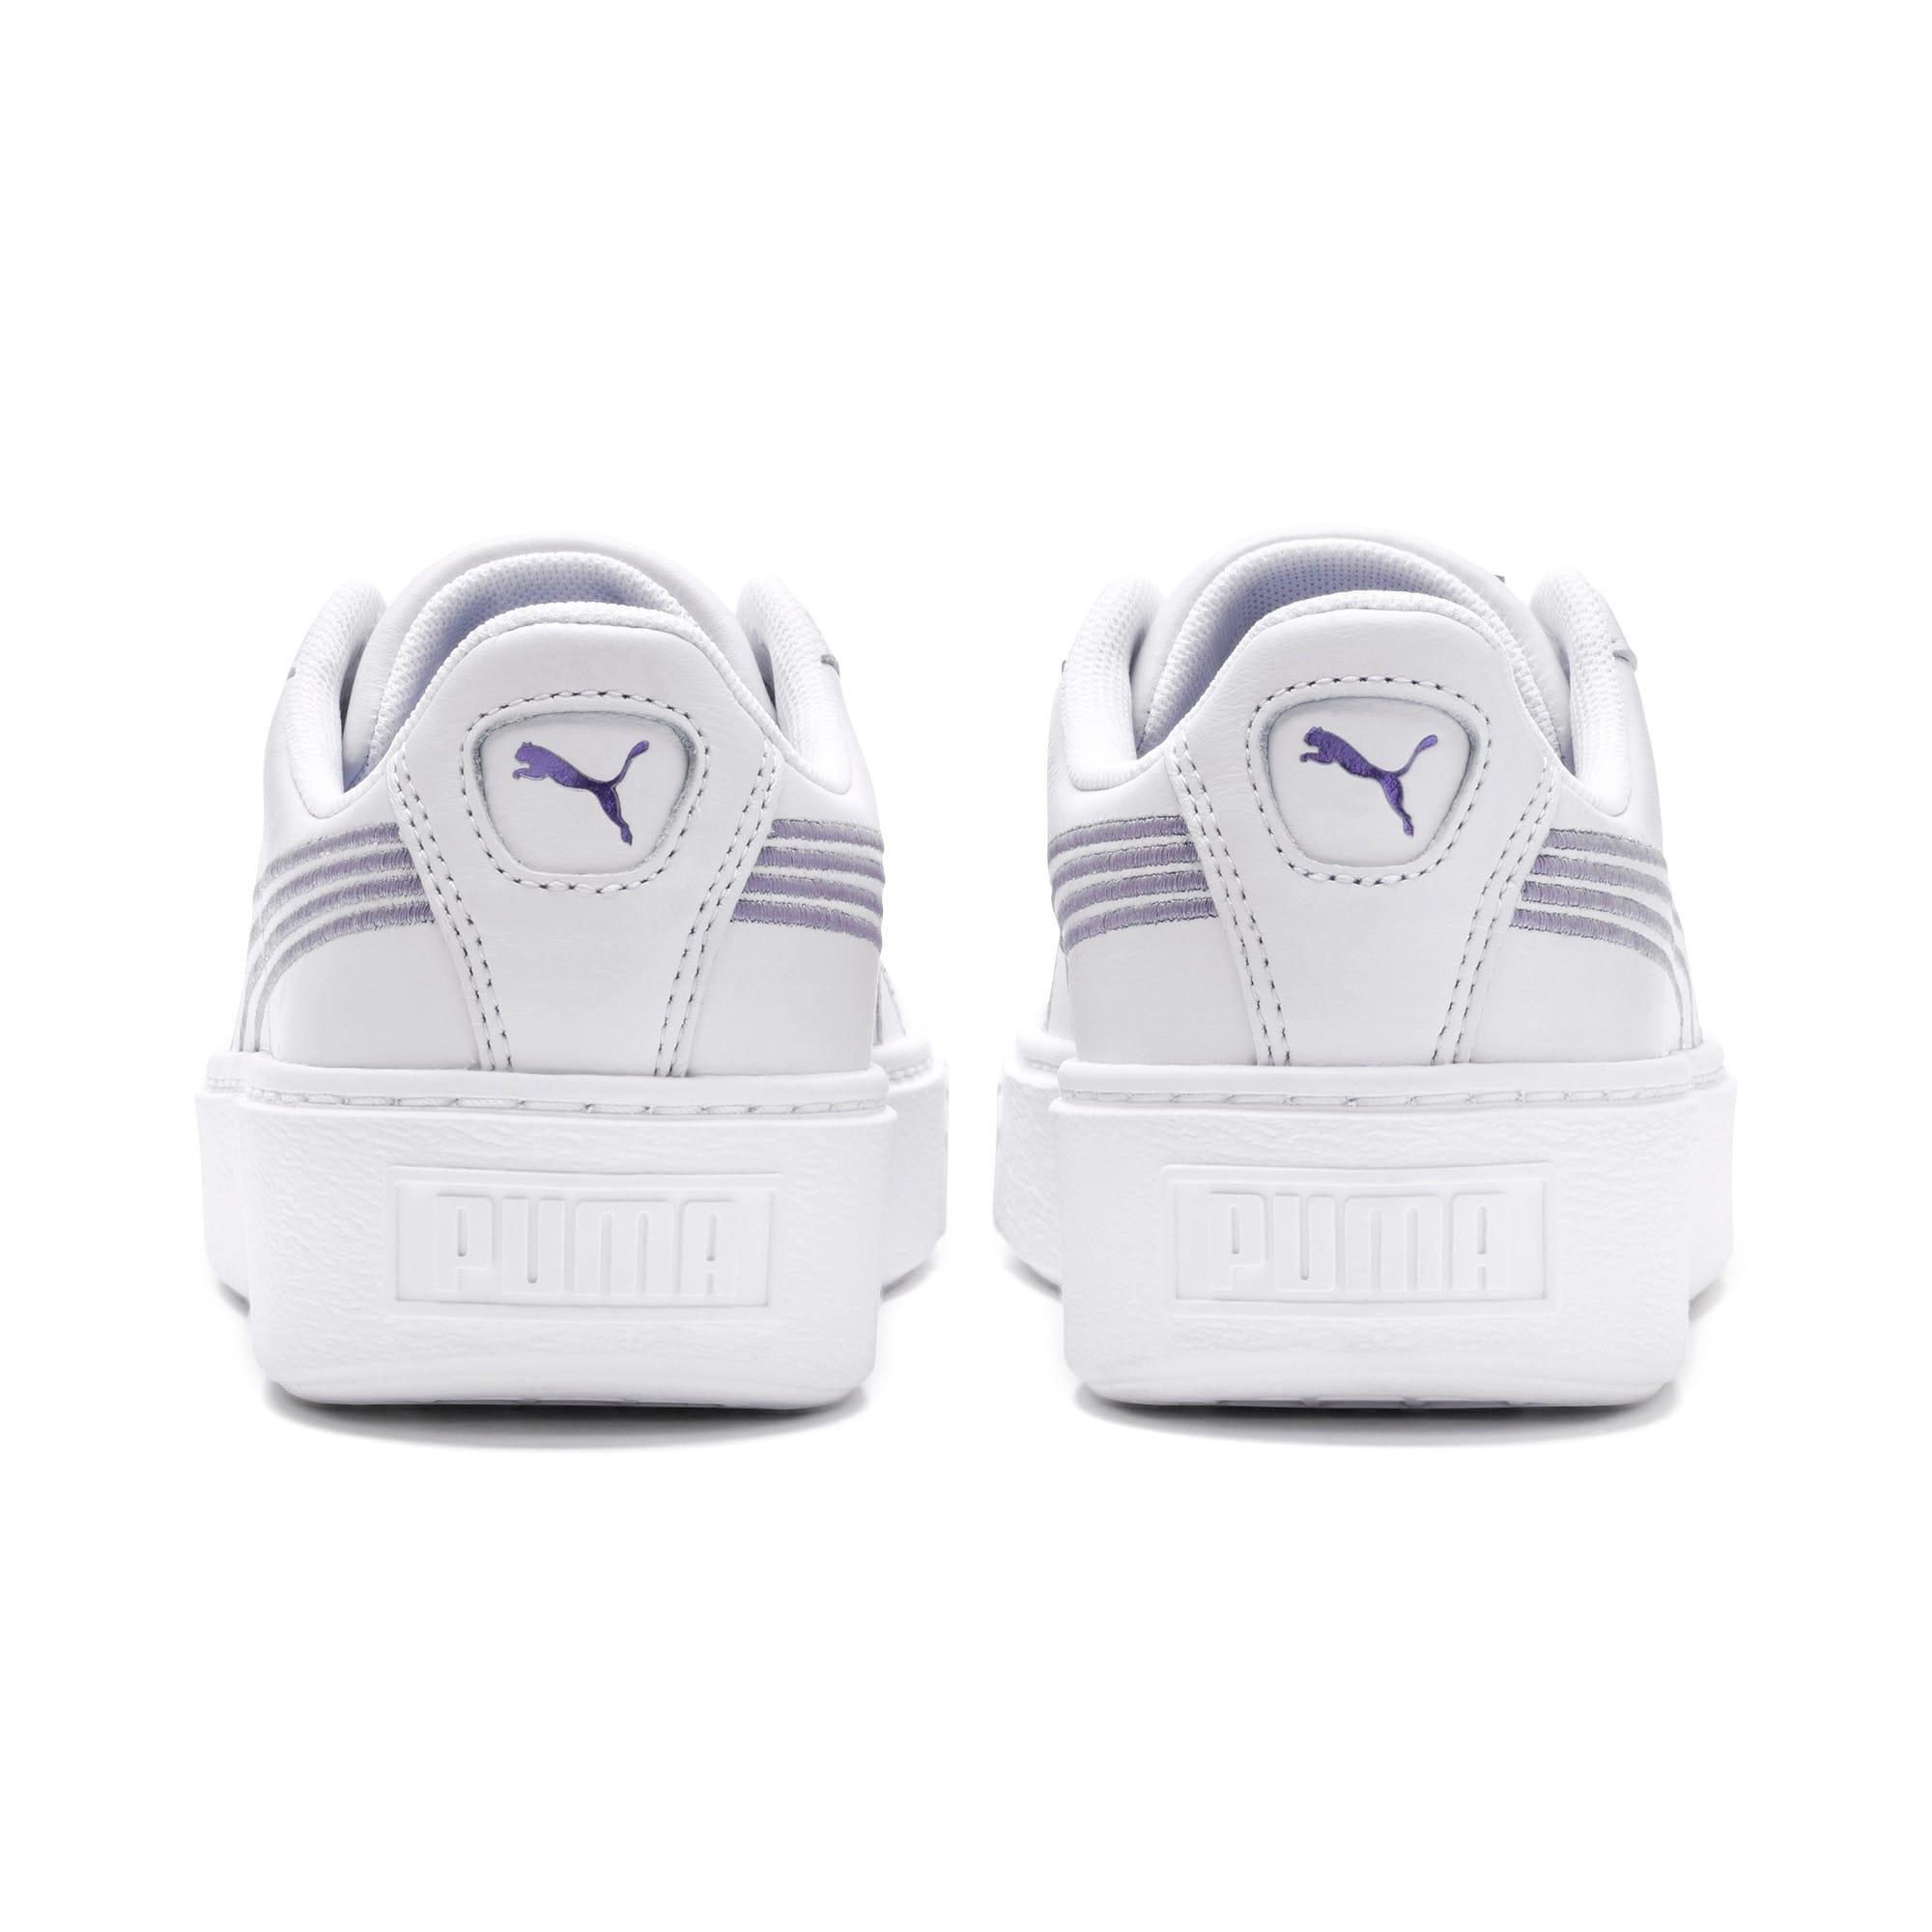 Thumbnail 4 of Basket Platform Twilight Women's Sneakers, Puma White-Sweet Lavender, medium